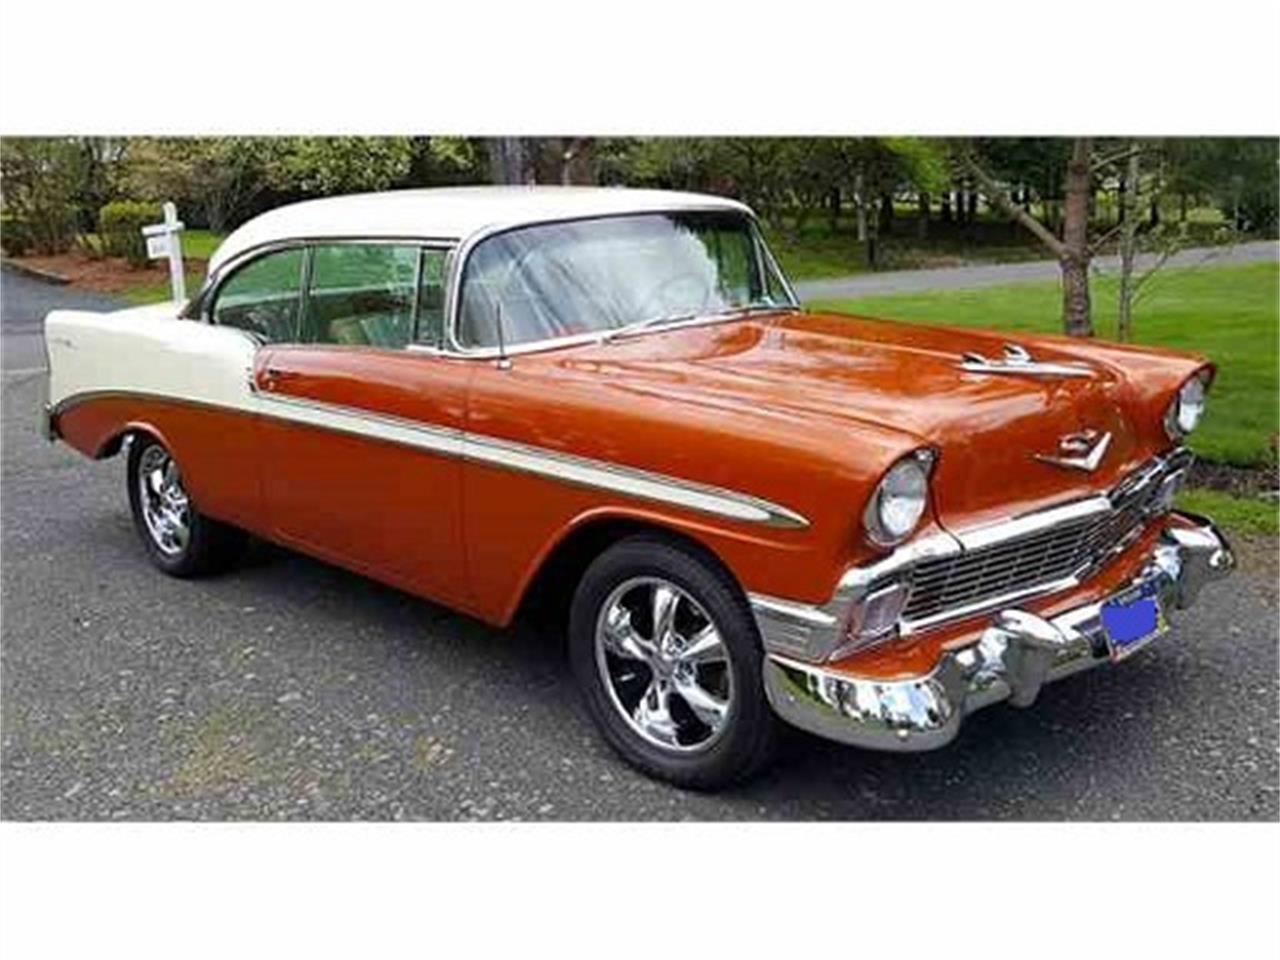 1956 Chevrolet Bel Air For Sale Classiccars Com Cc 995206